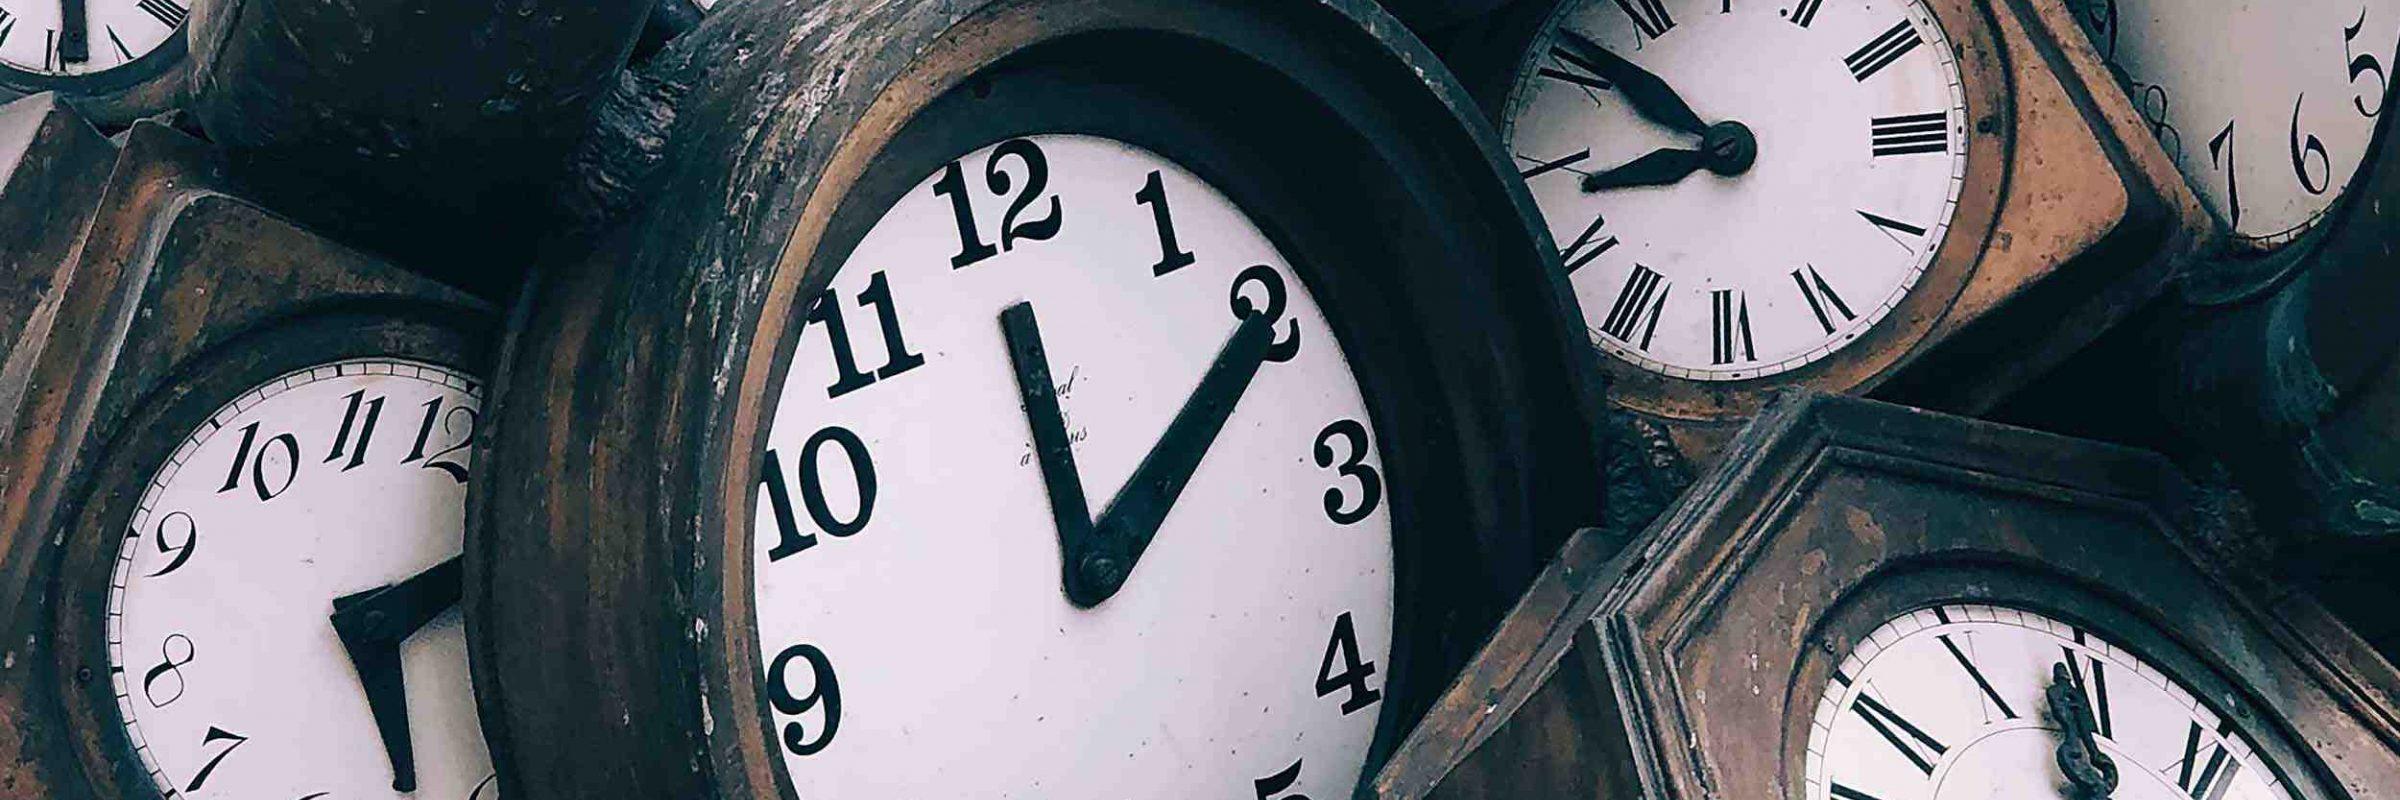 Clocks